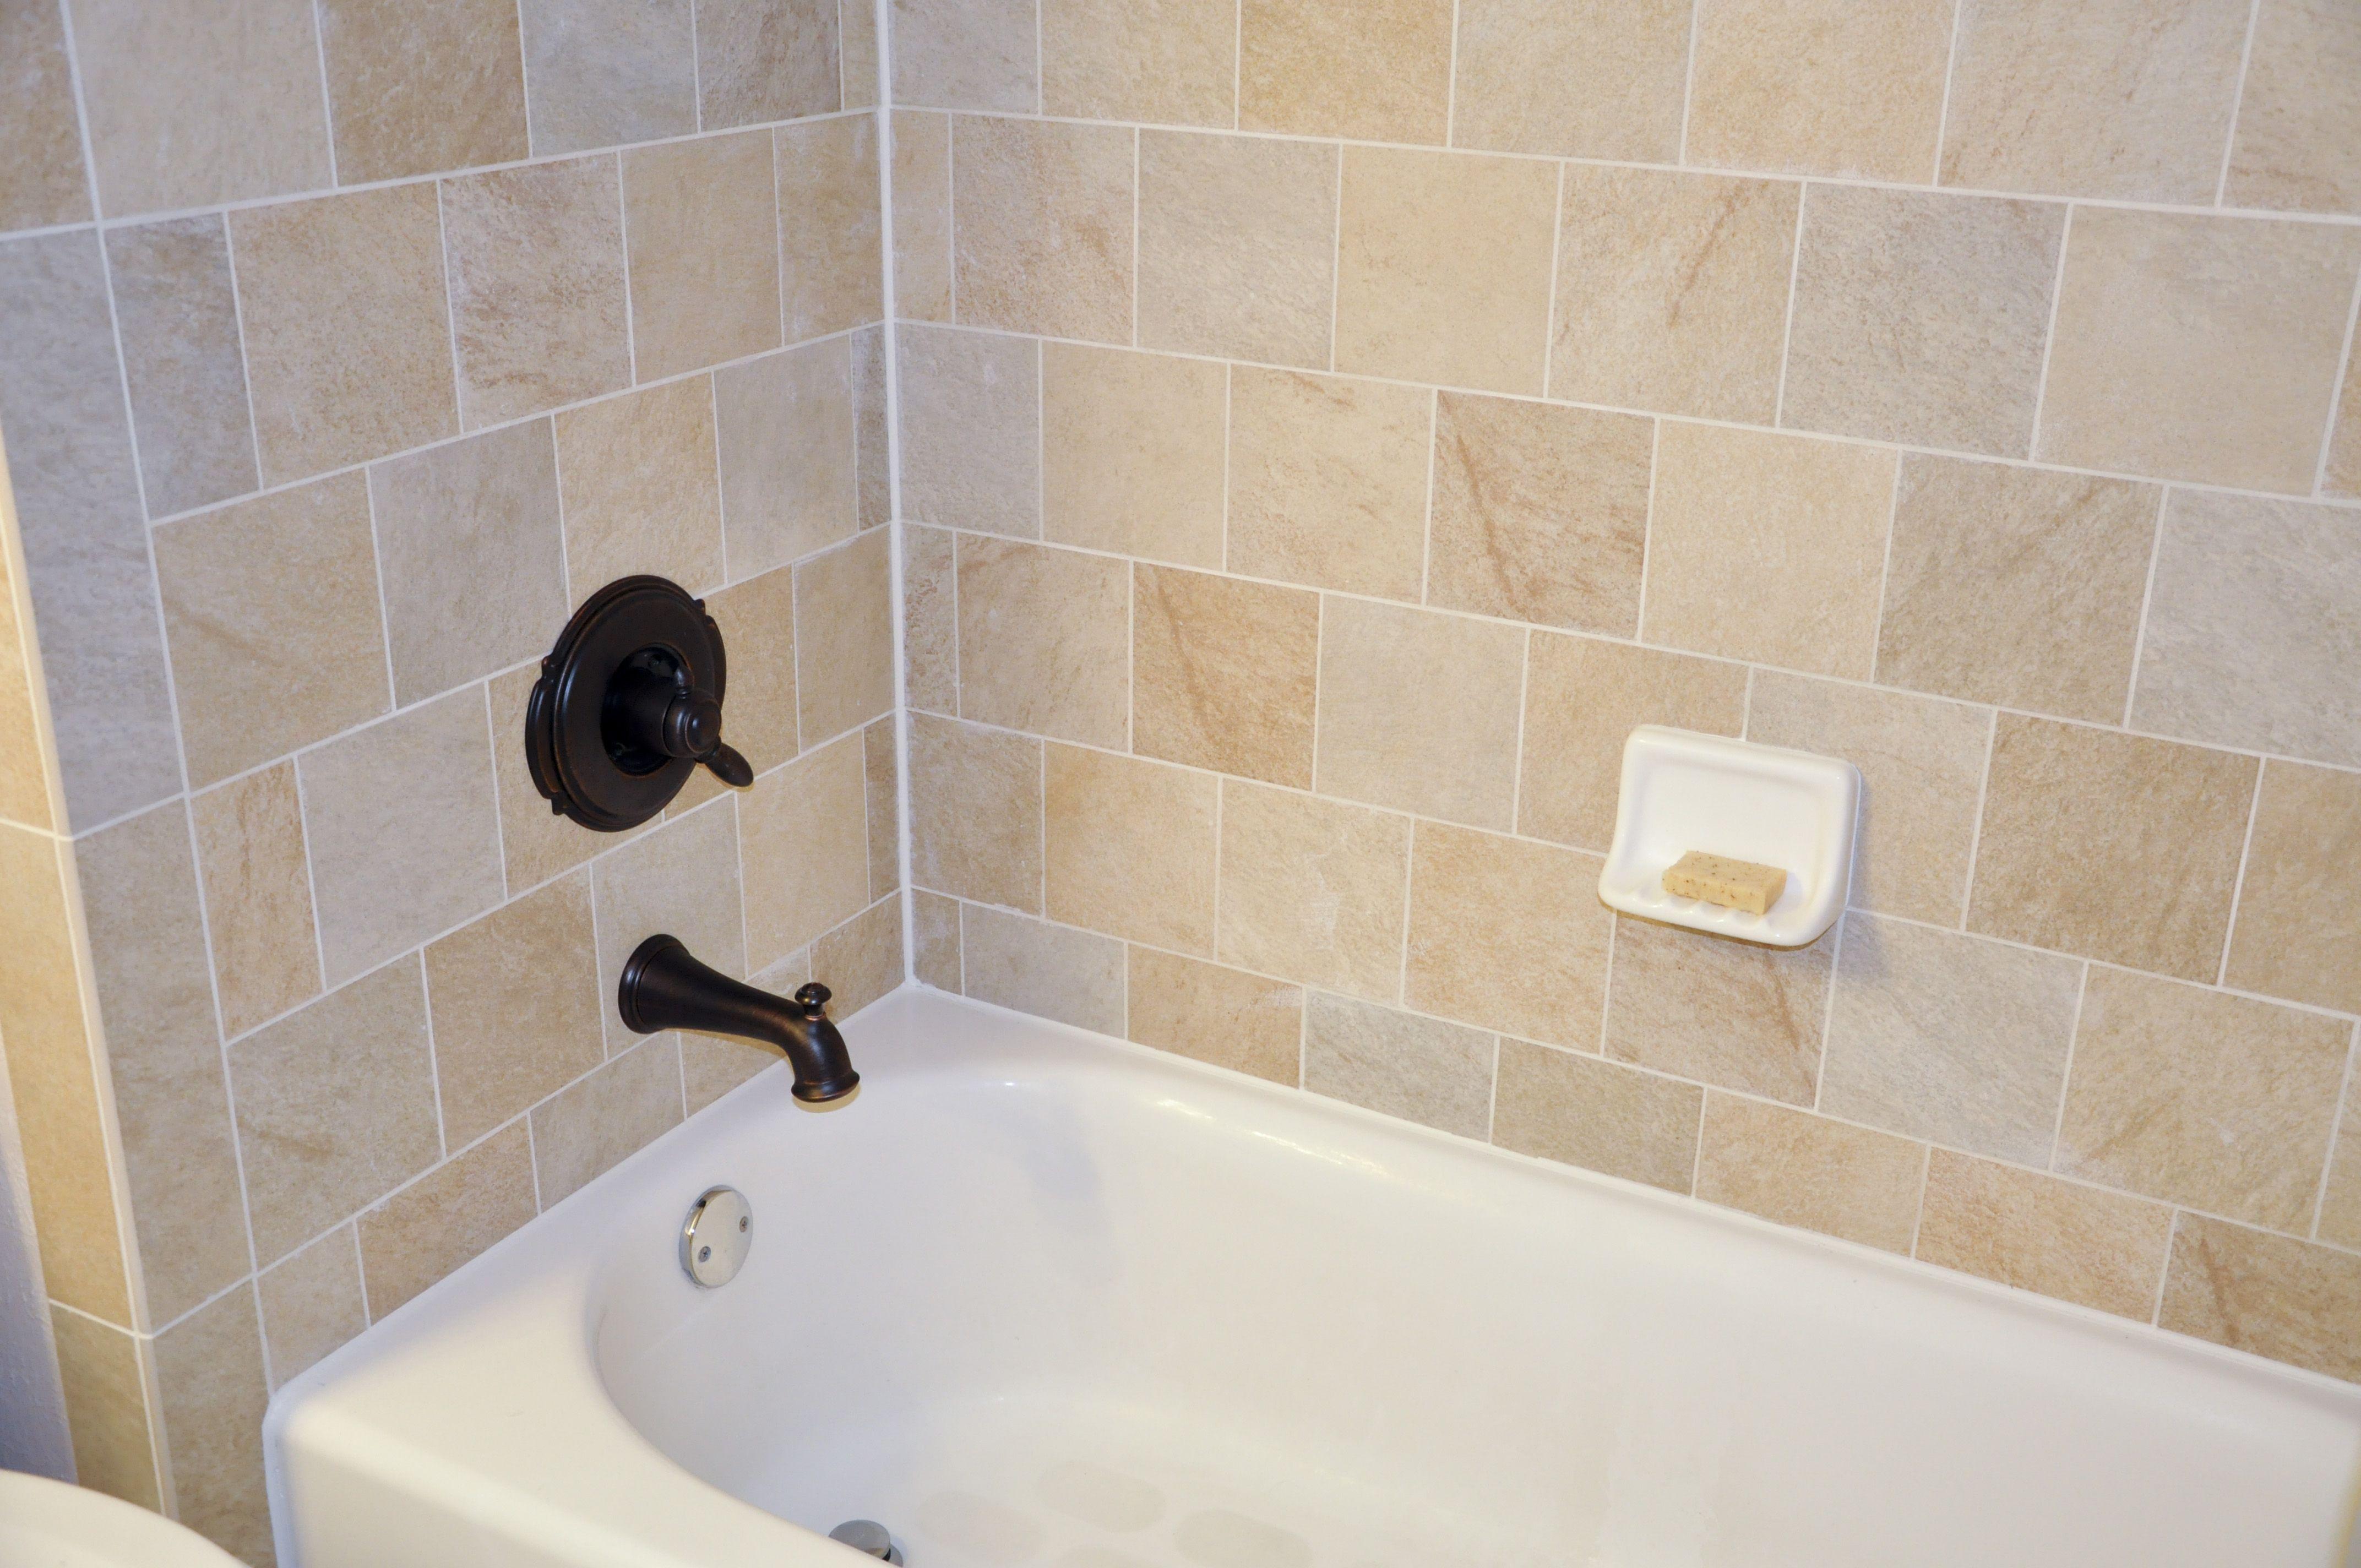 Best way to clean bathroom walls - Best Way To Clean Bathroom Walls